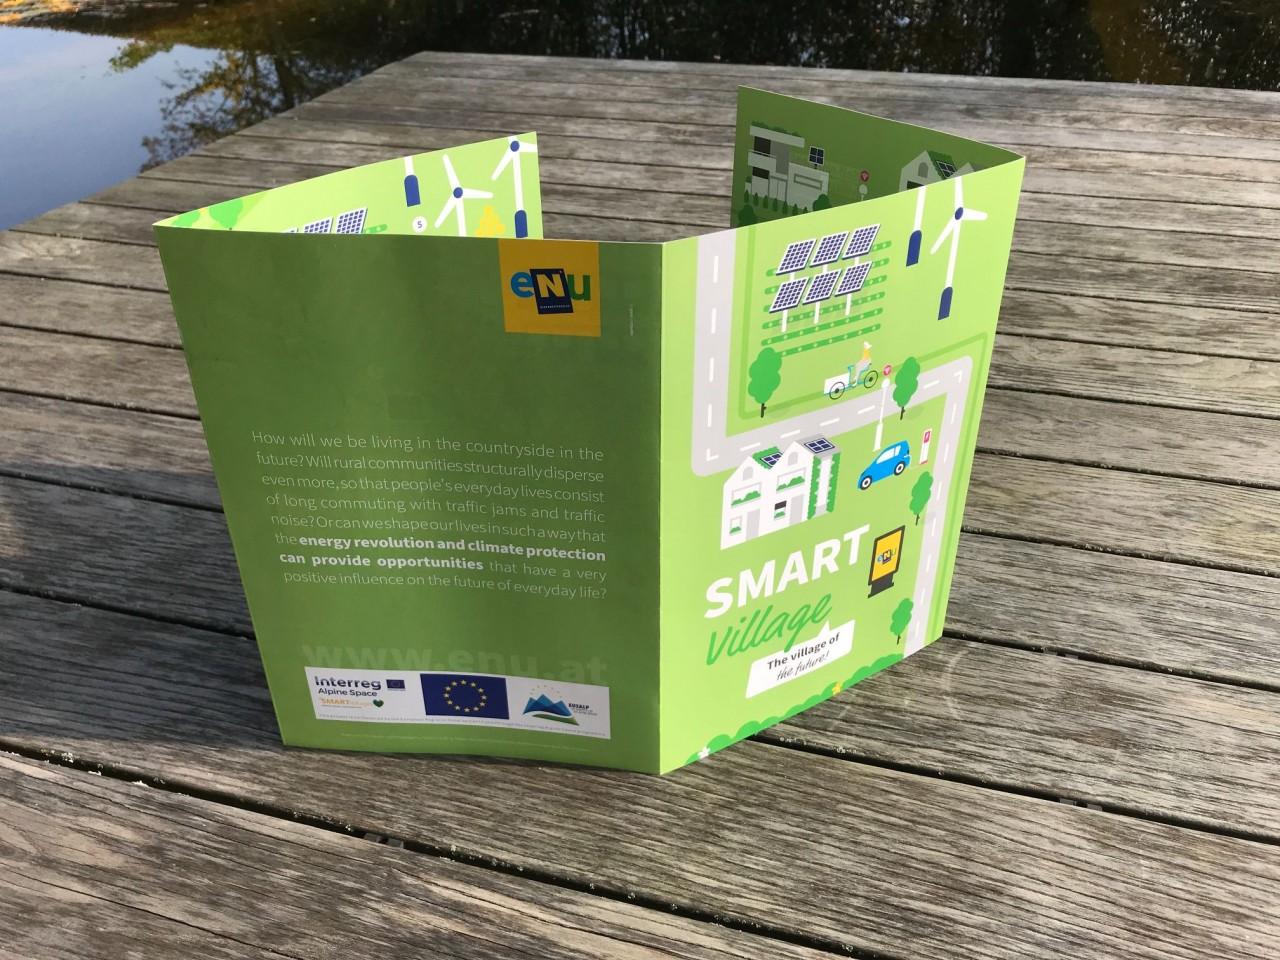 enu-smart-village-broschuere-folder-01.jpg